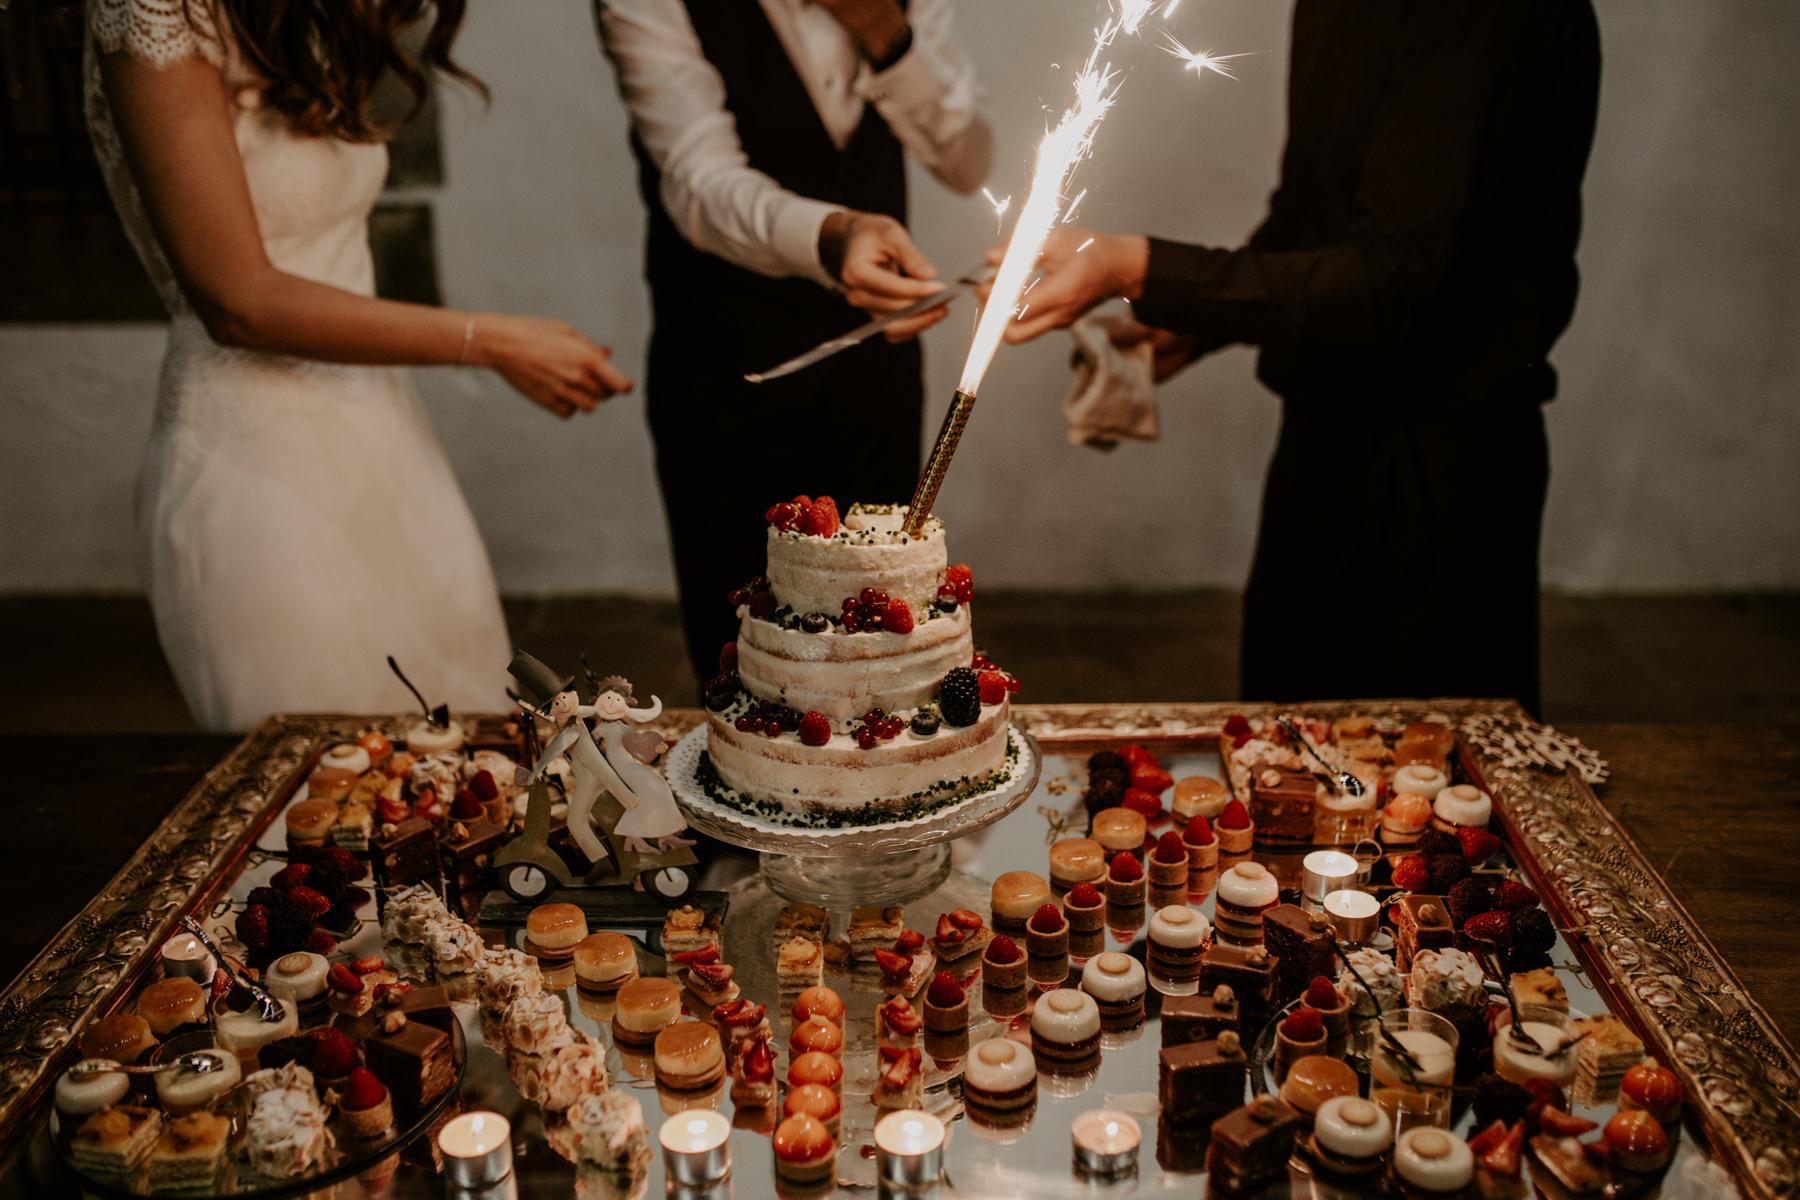 alt_thenortherngirlphotography_couples_weddingphotographer_photographer_wedding_boda_fotografodebodas_fotografobodasbarcelona_bodaindie_bodasconestilo_bodaensantperedeclara_jennifermiguel-838.jpg